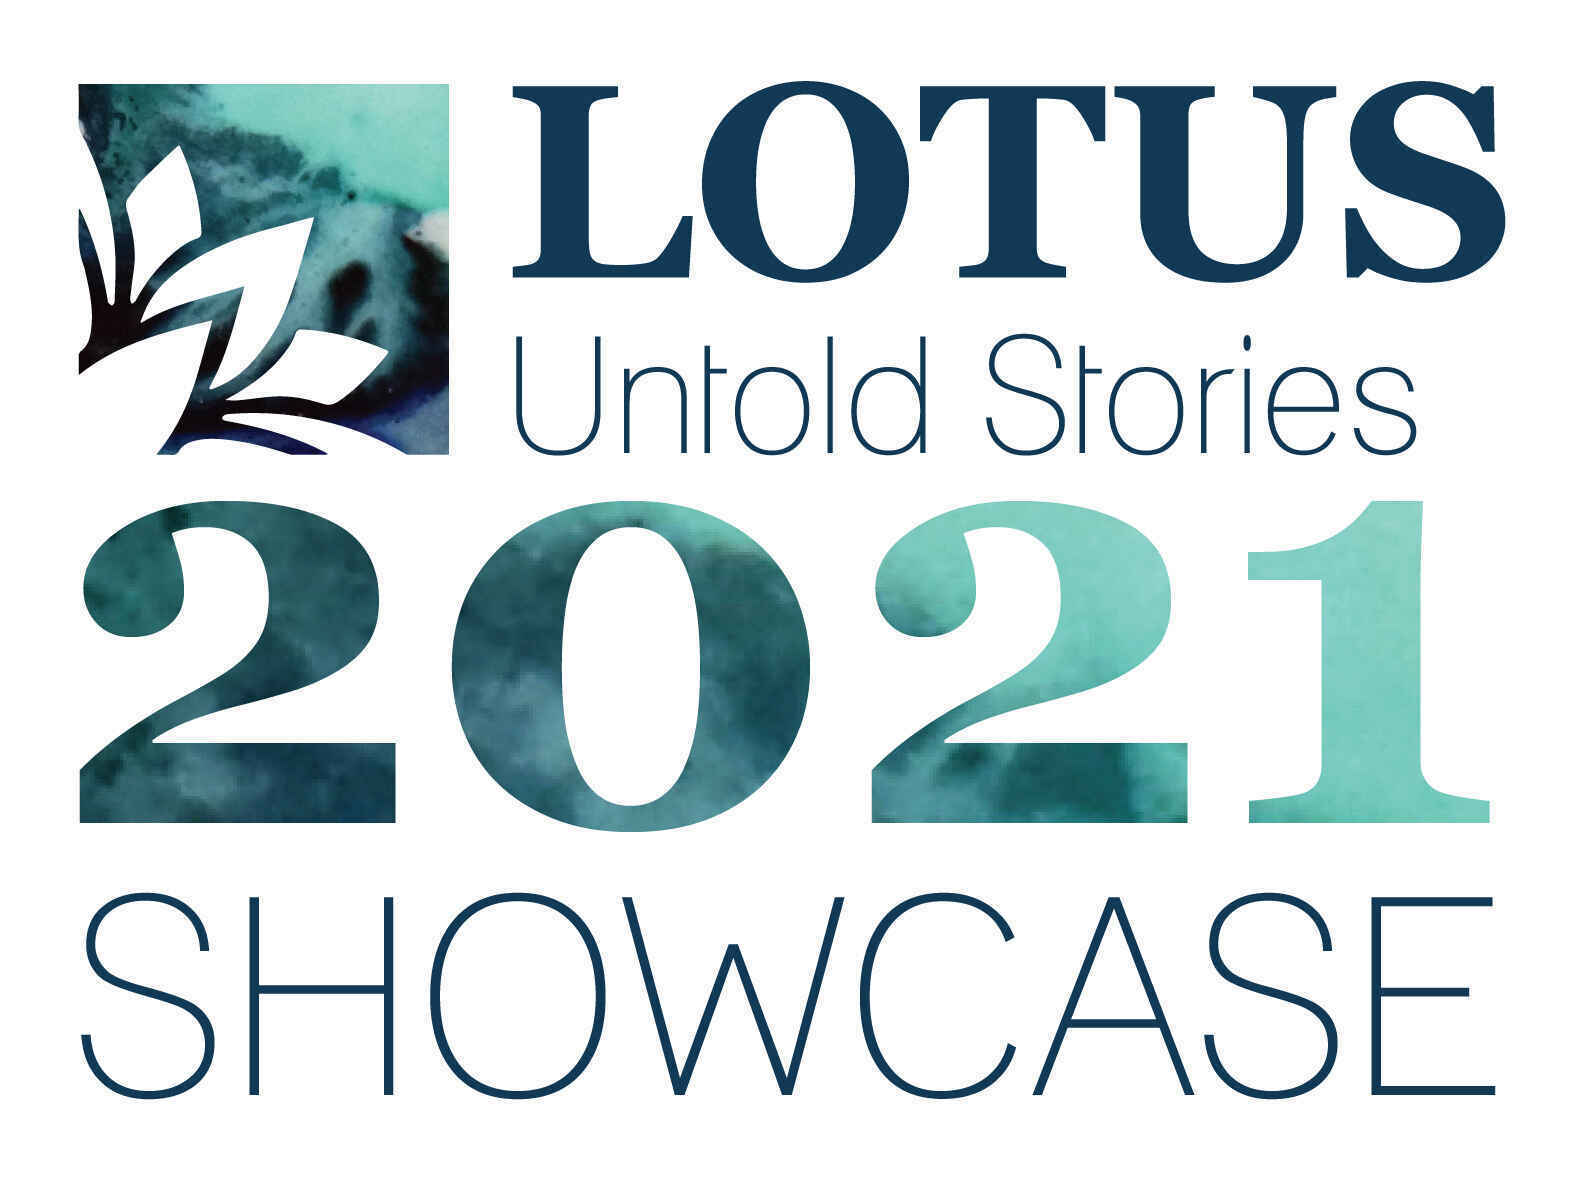 2021 UNTOLD STORIES SHOWCASE image